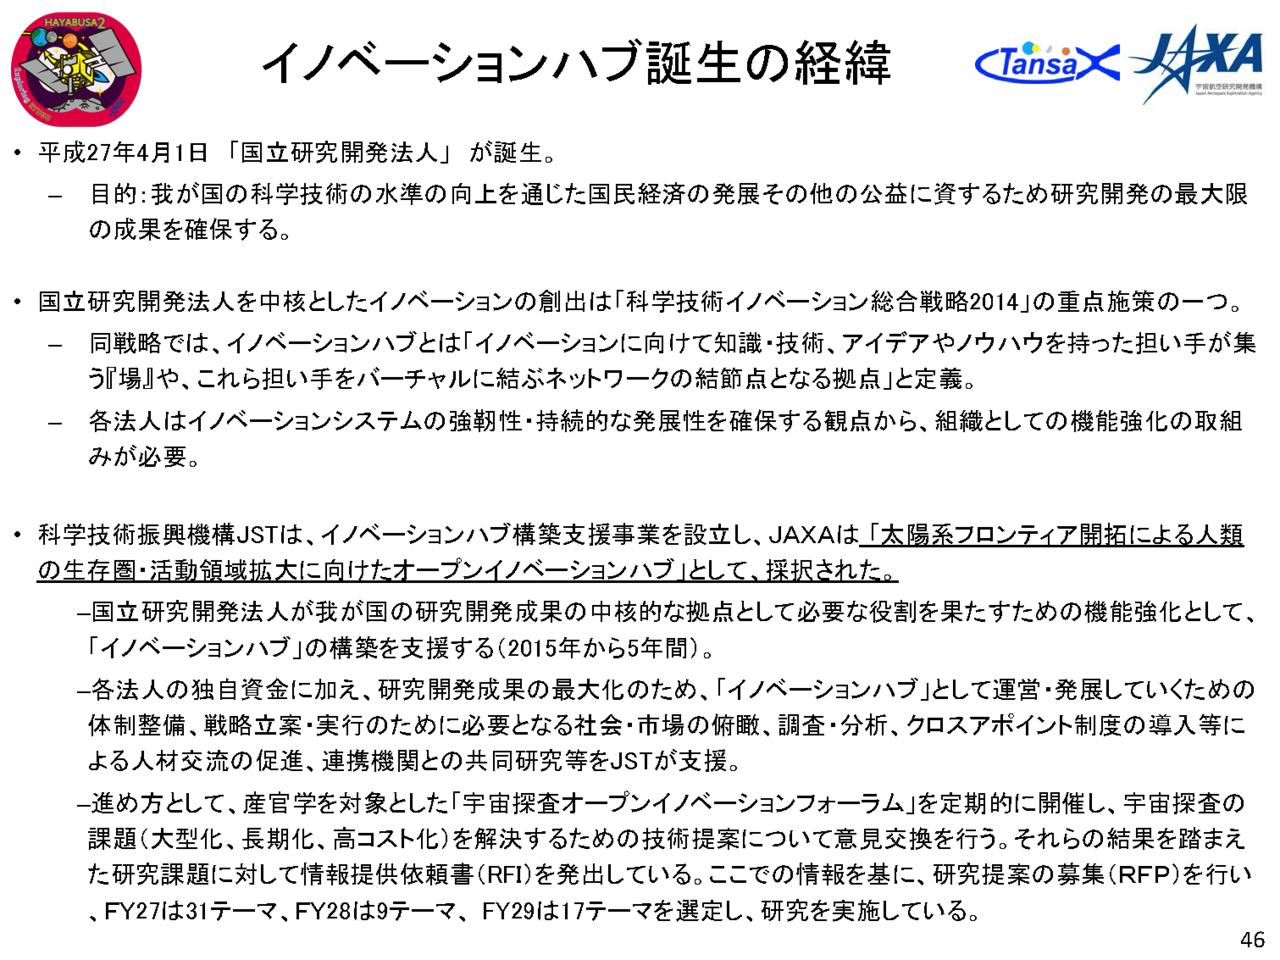 f:id:Imamura:20180802150006p:plain